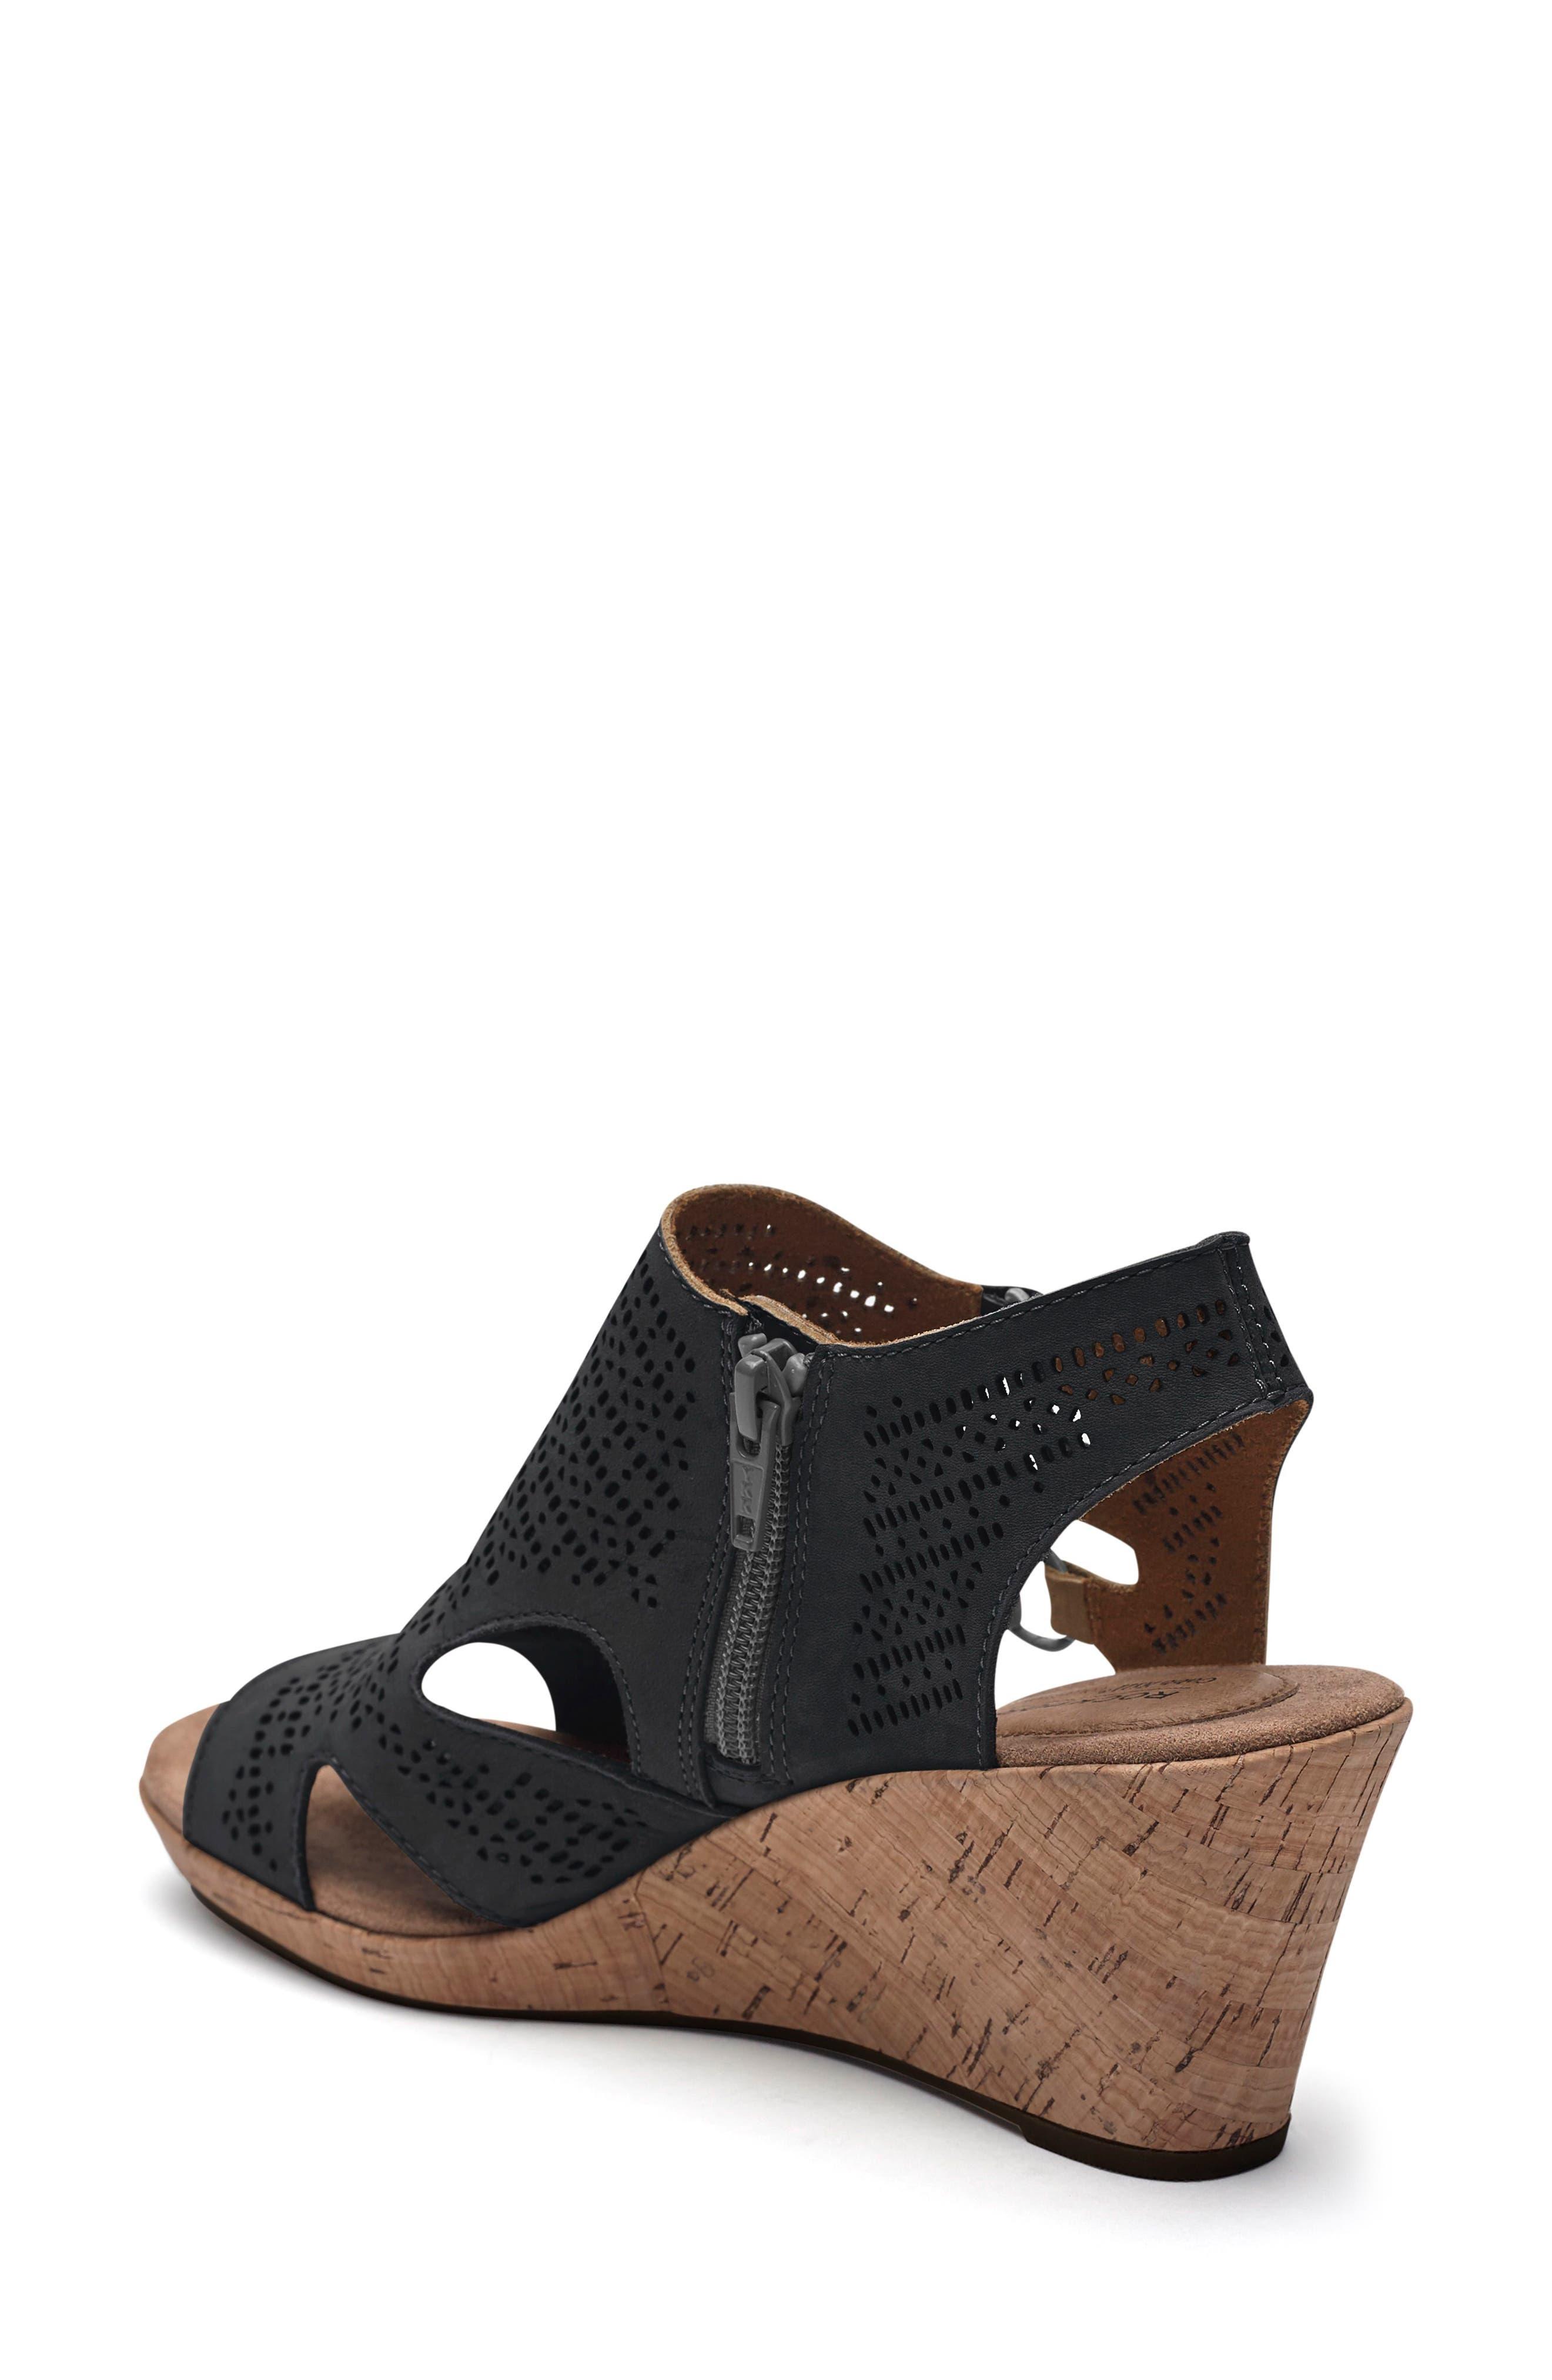 Janna Perforated Wedge Sandal,                             Alternate thumbnail 2, color,                             BLACK NUBUCK LEATHER